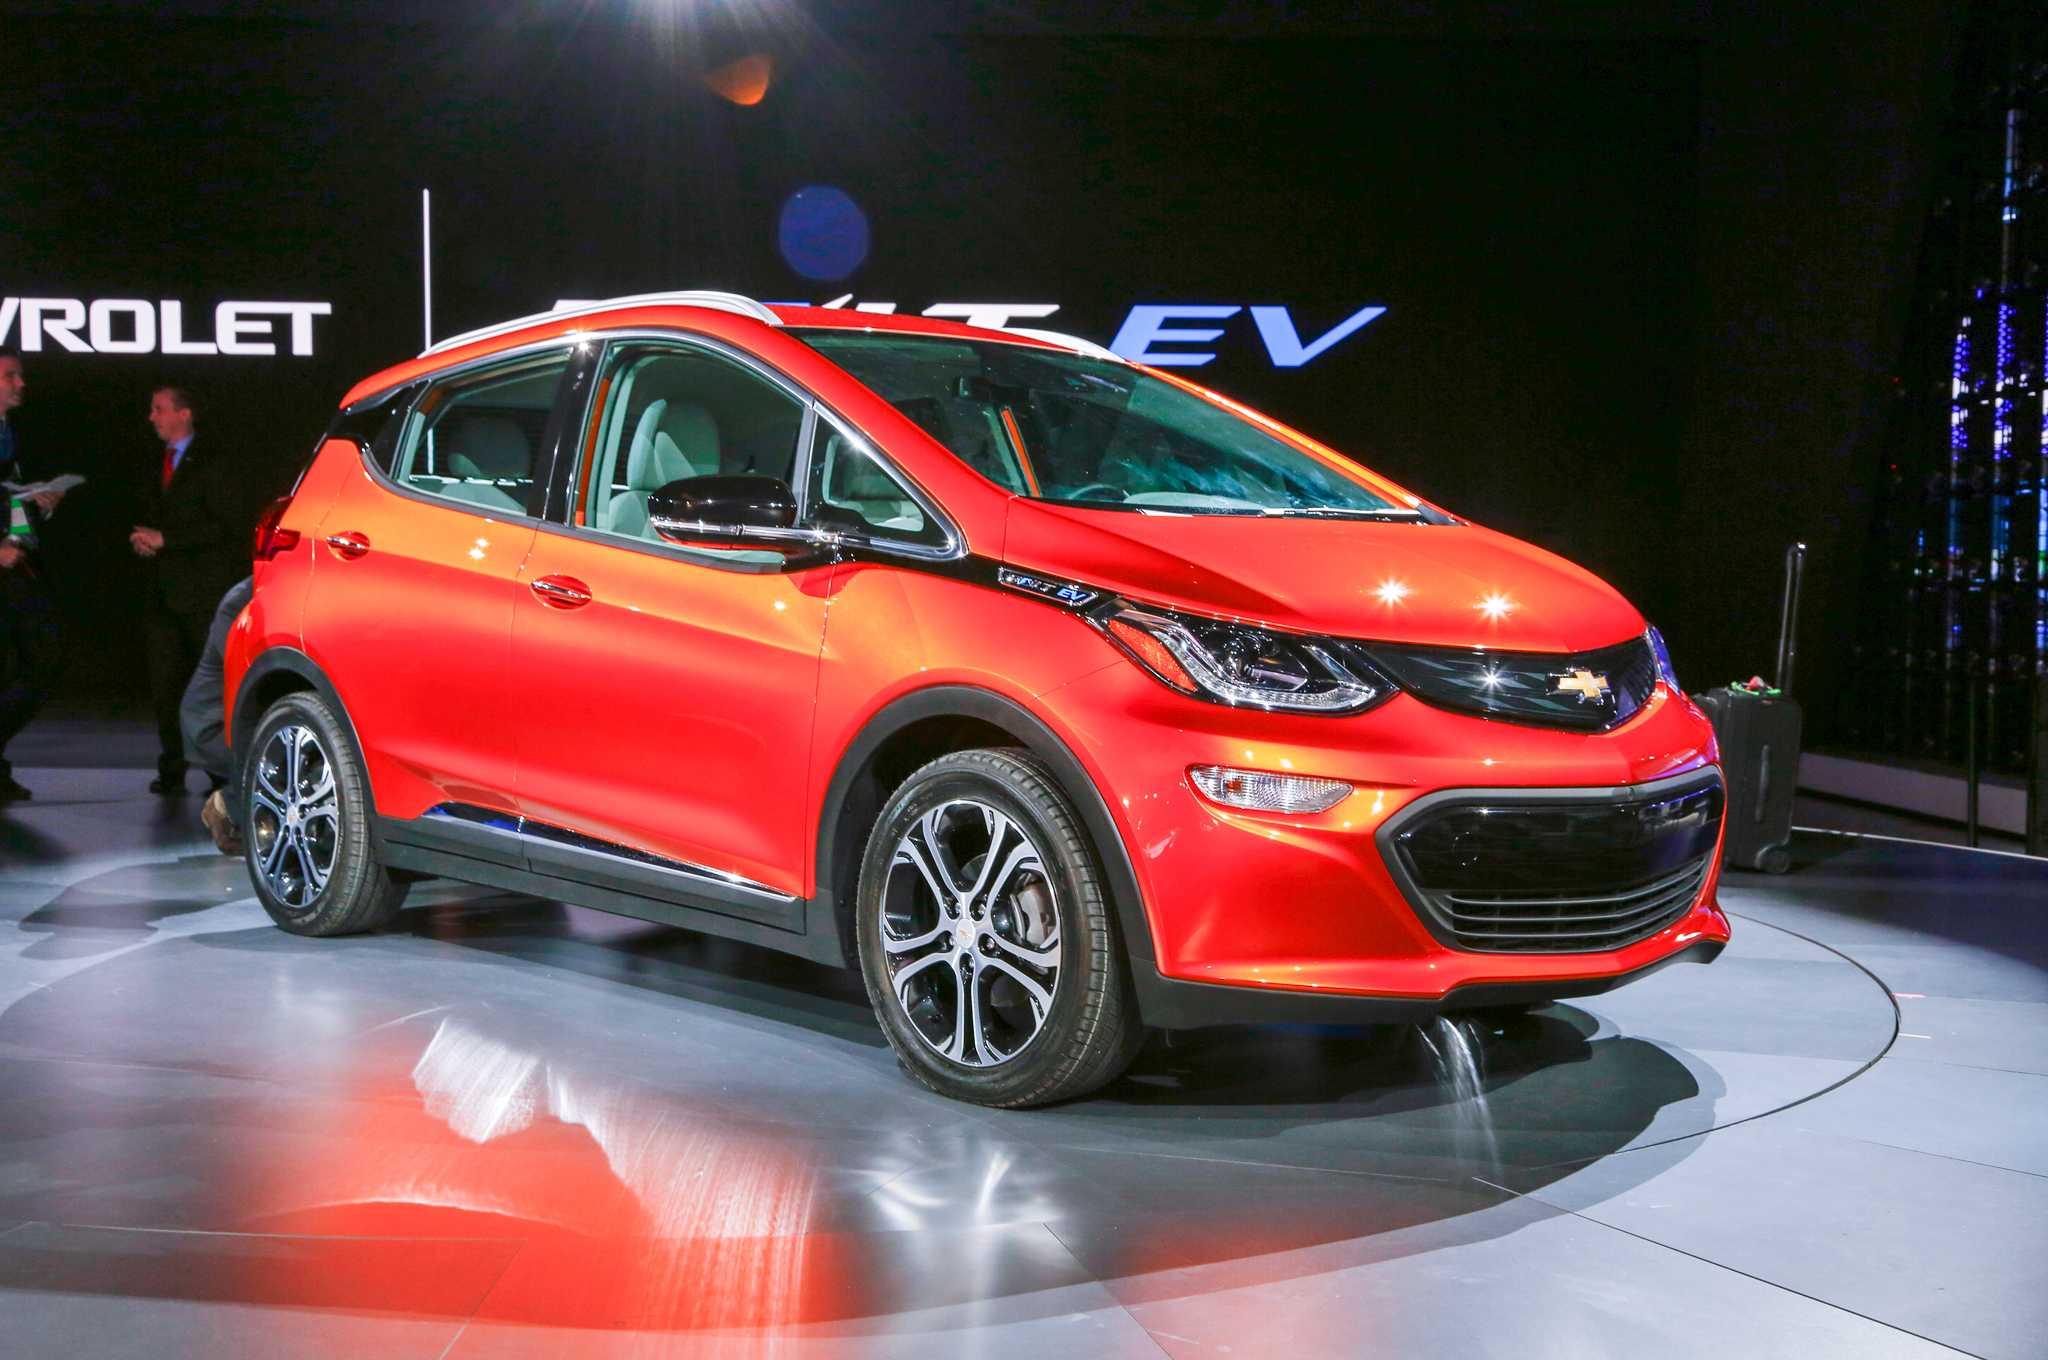 2017 Chevrolet Bolt Ev Set To Offer 238 Miles On Single Charge